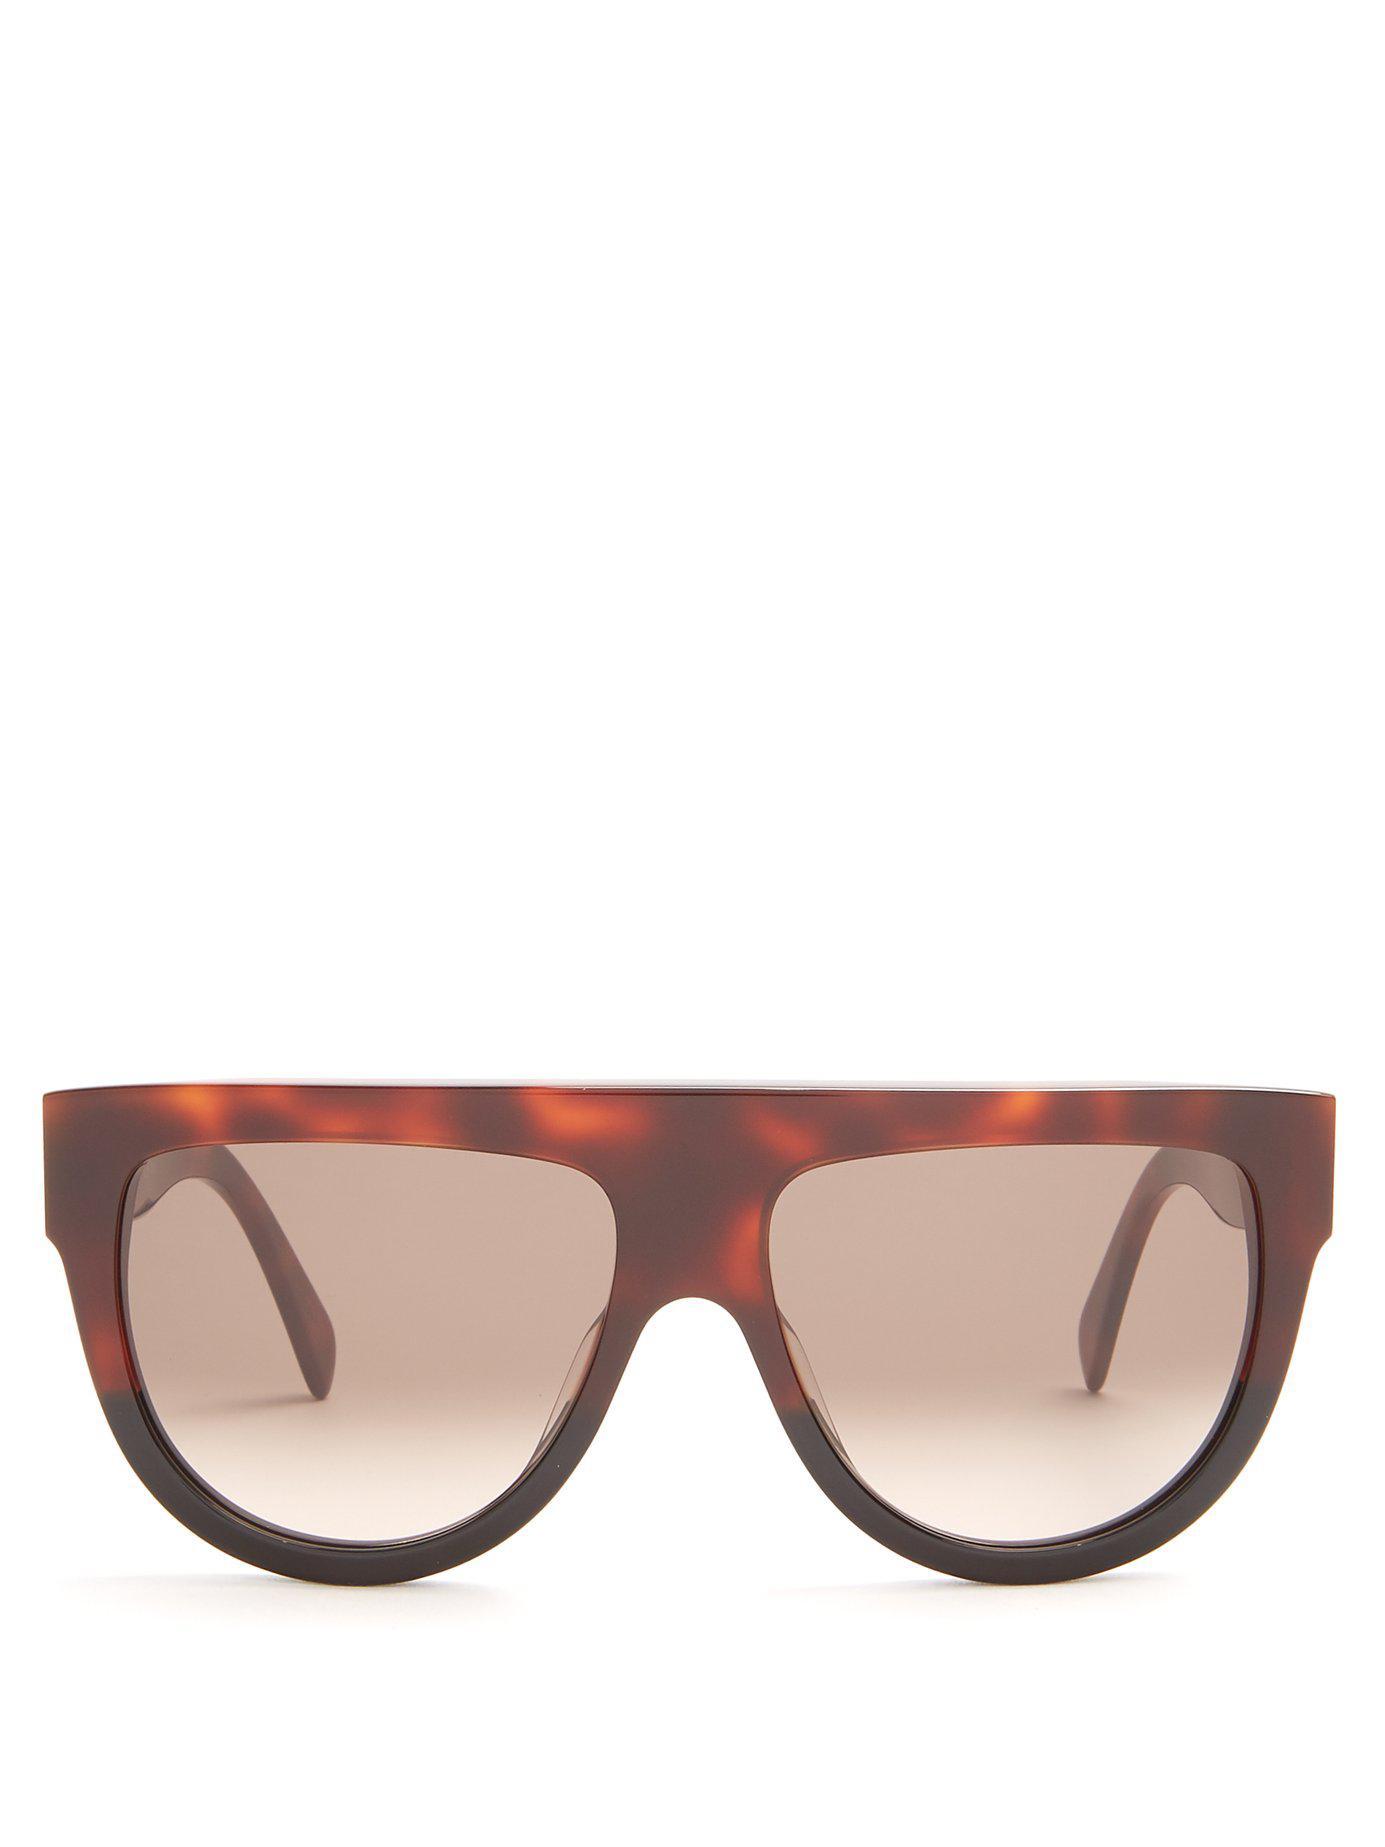 e29608a7ea08 Lyst - Céline Shadow D Frame Acetate Sunglasses in Brown - Save 3%